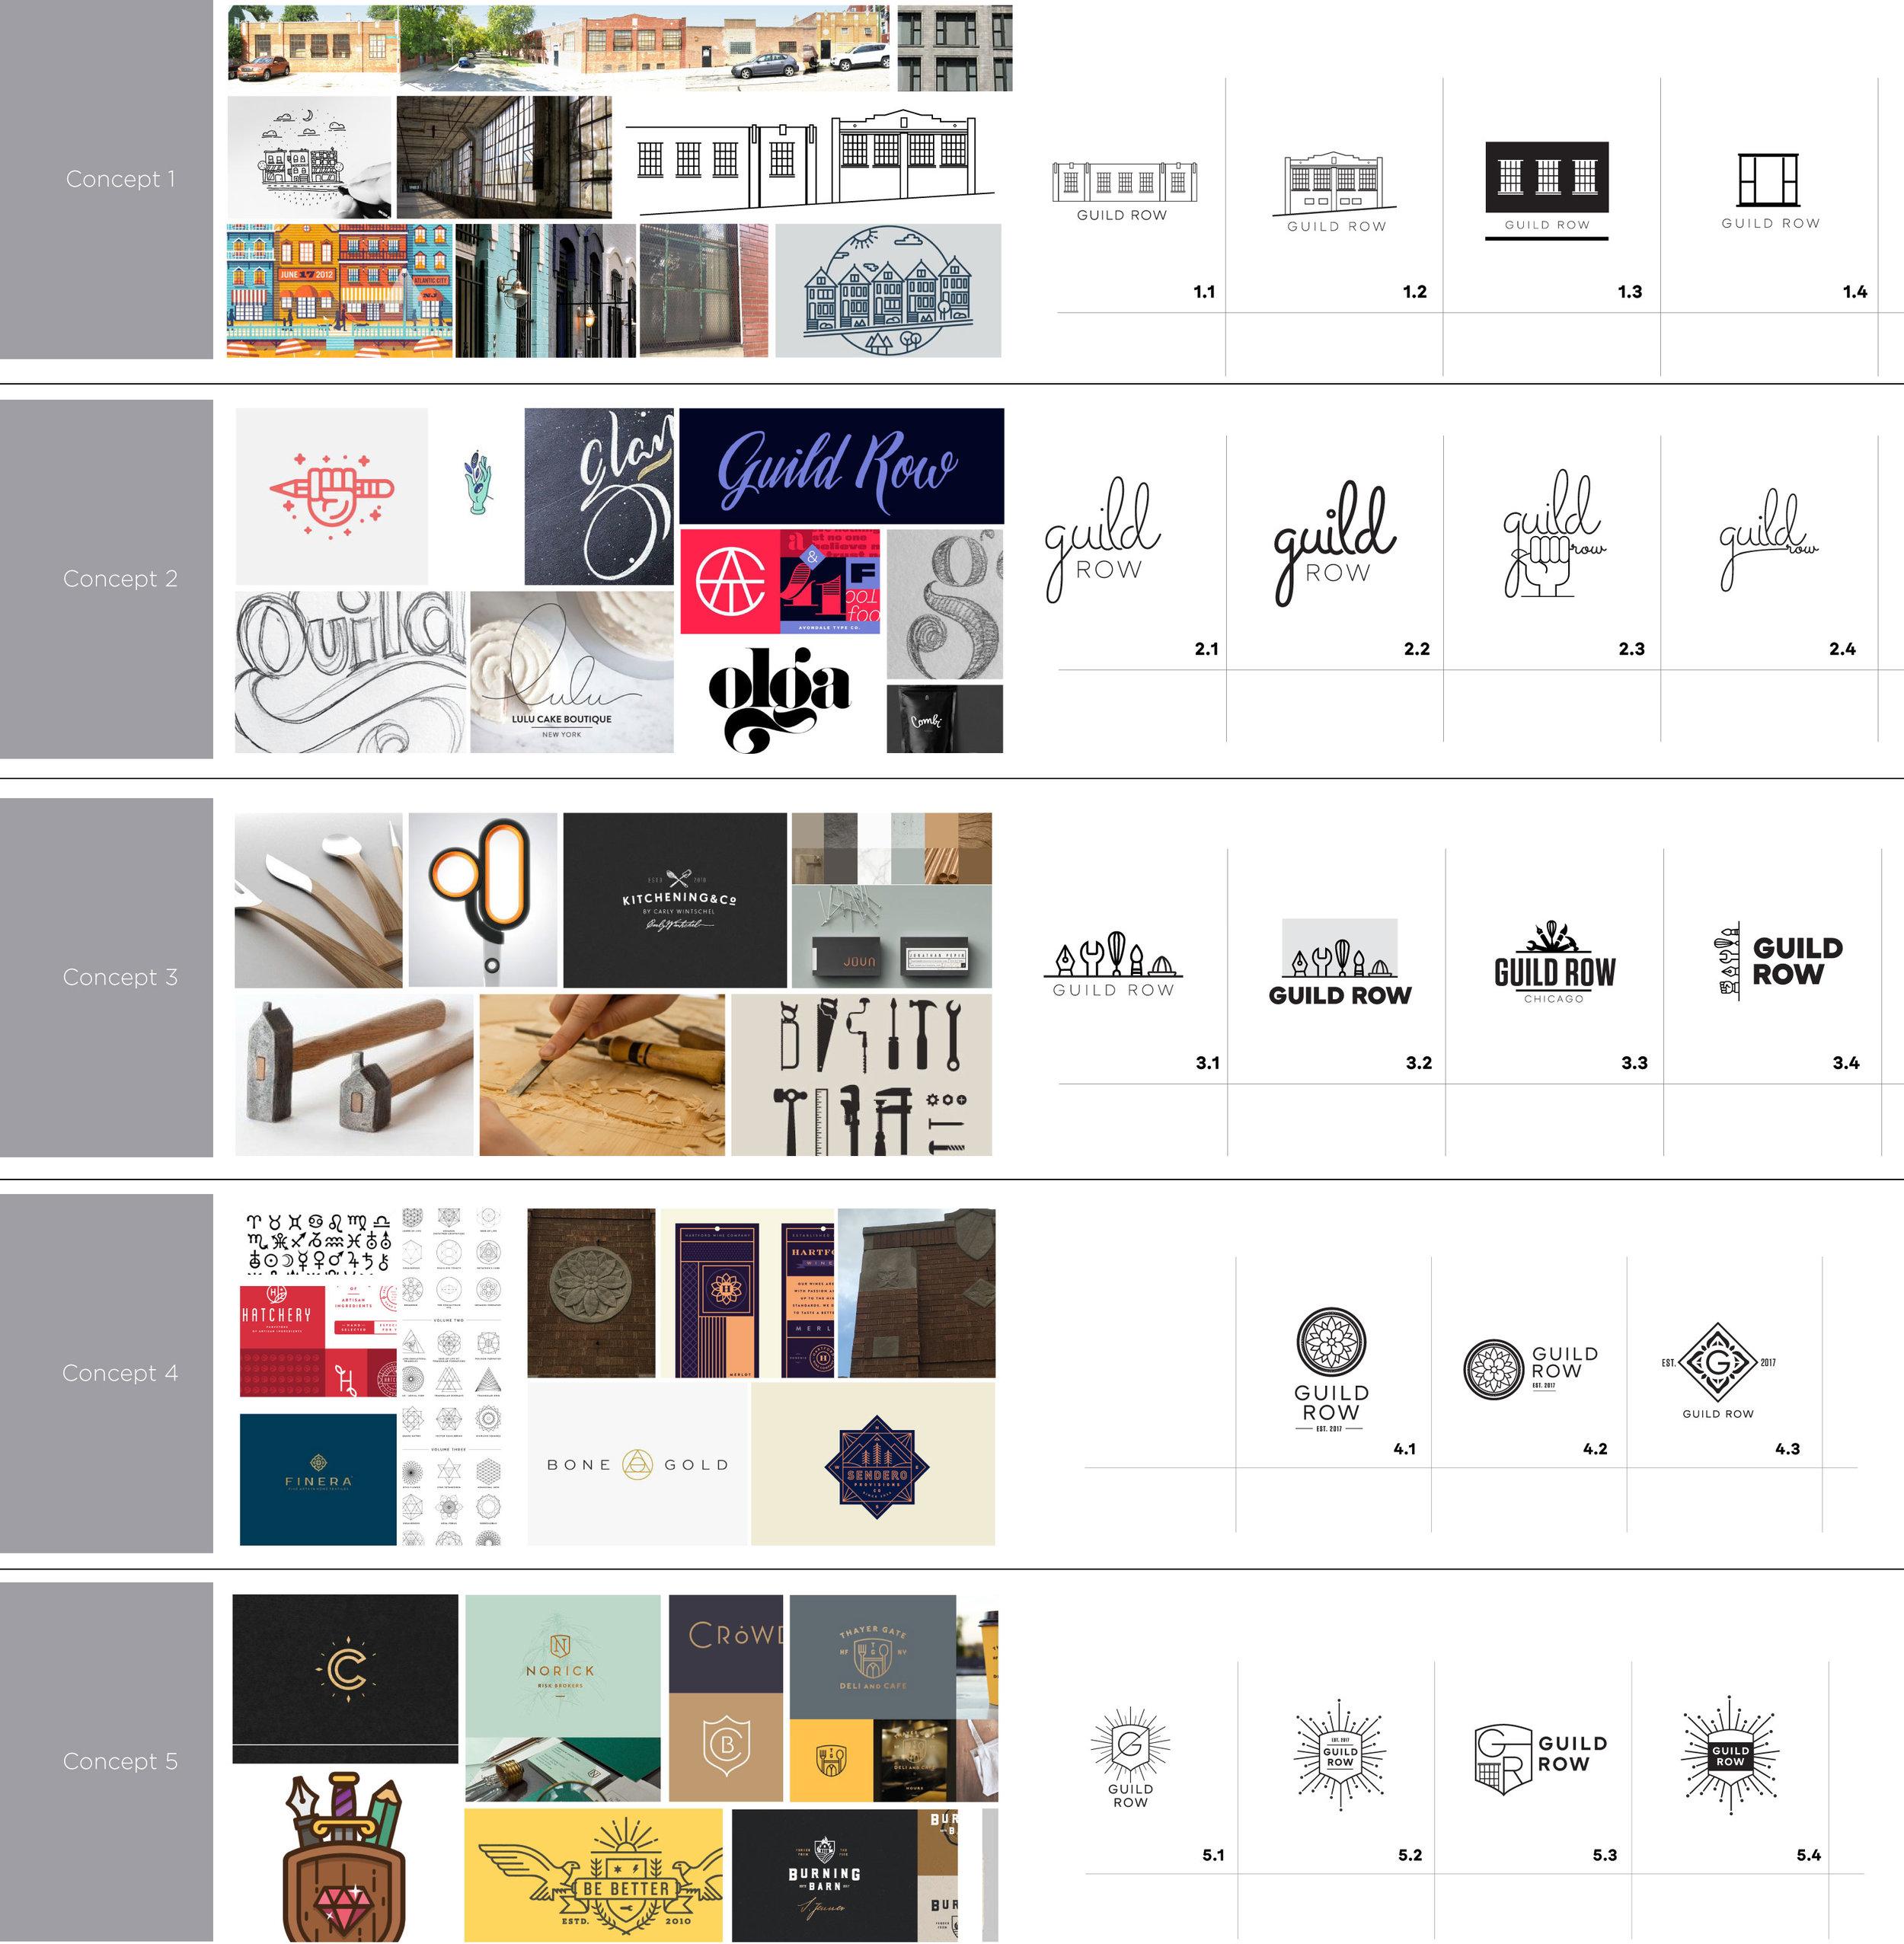 Design Concepts - Round 1